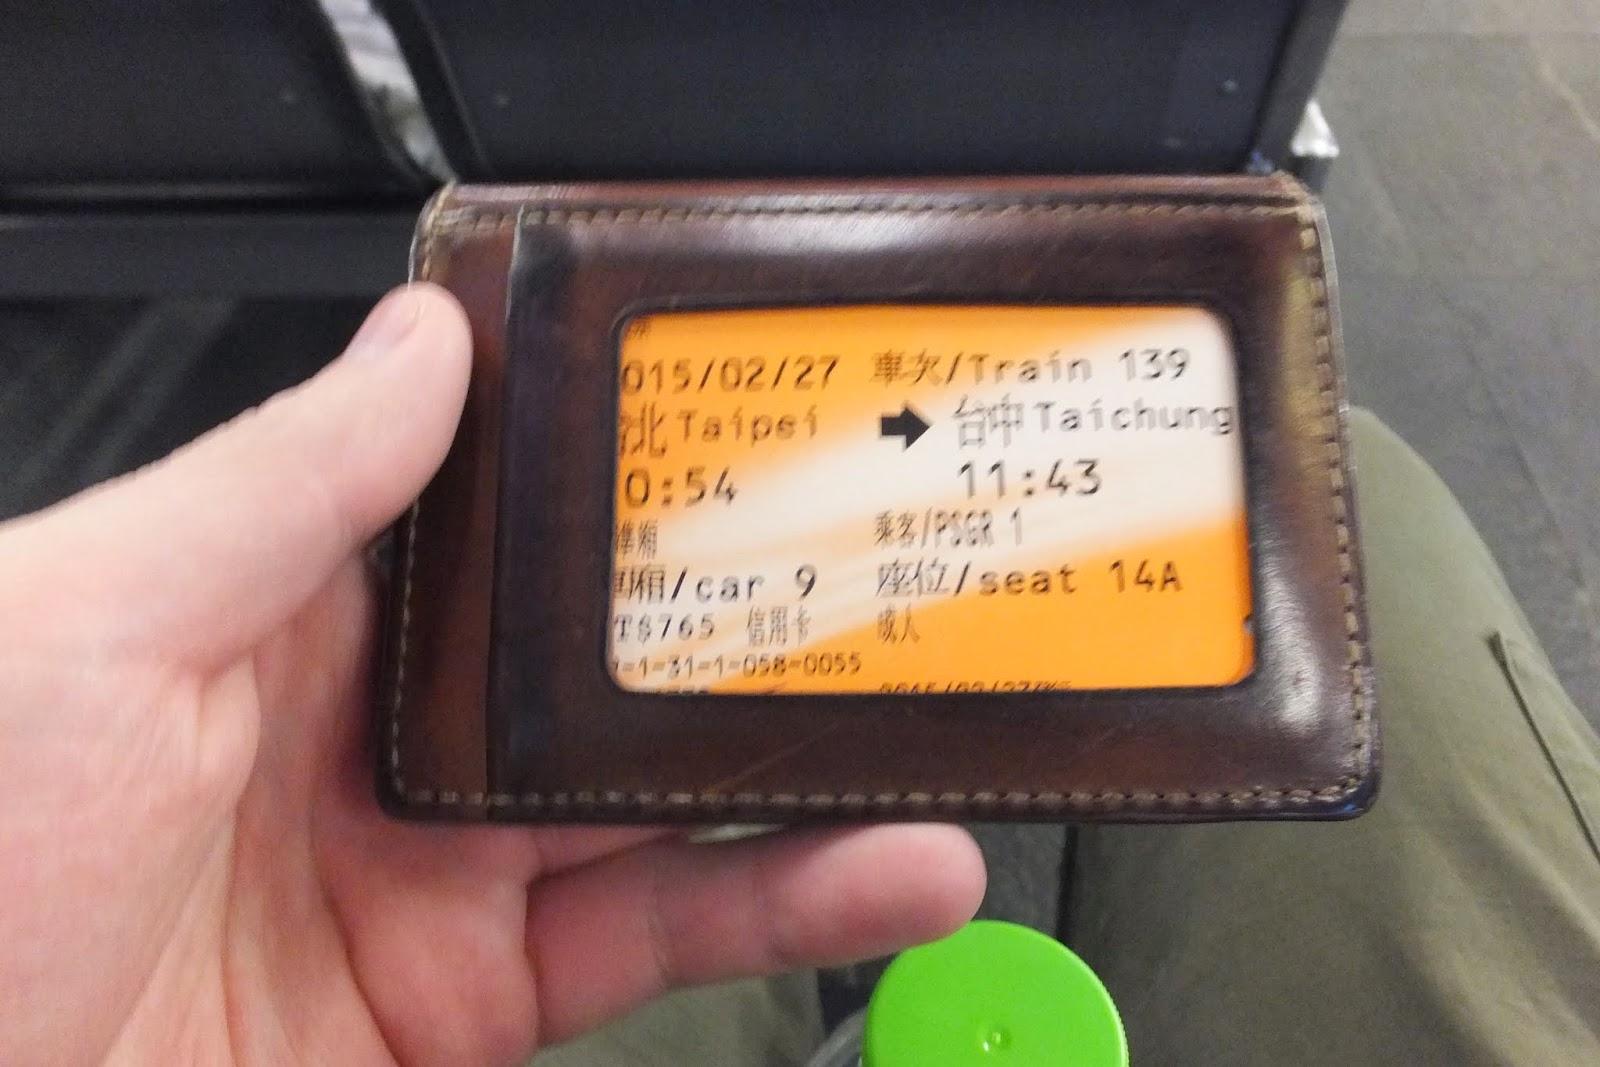 THSR ticket